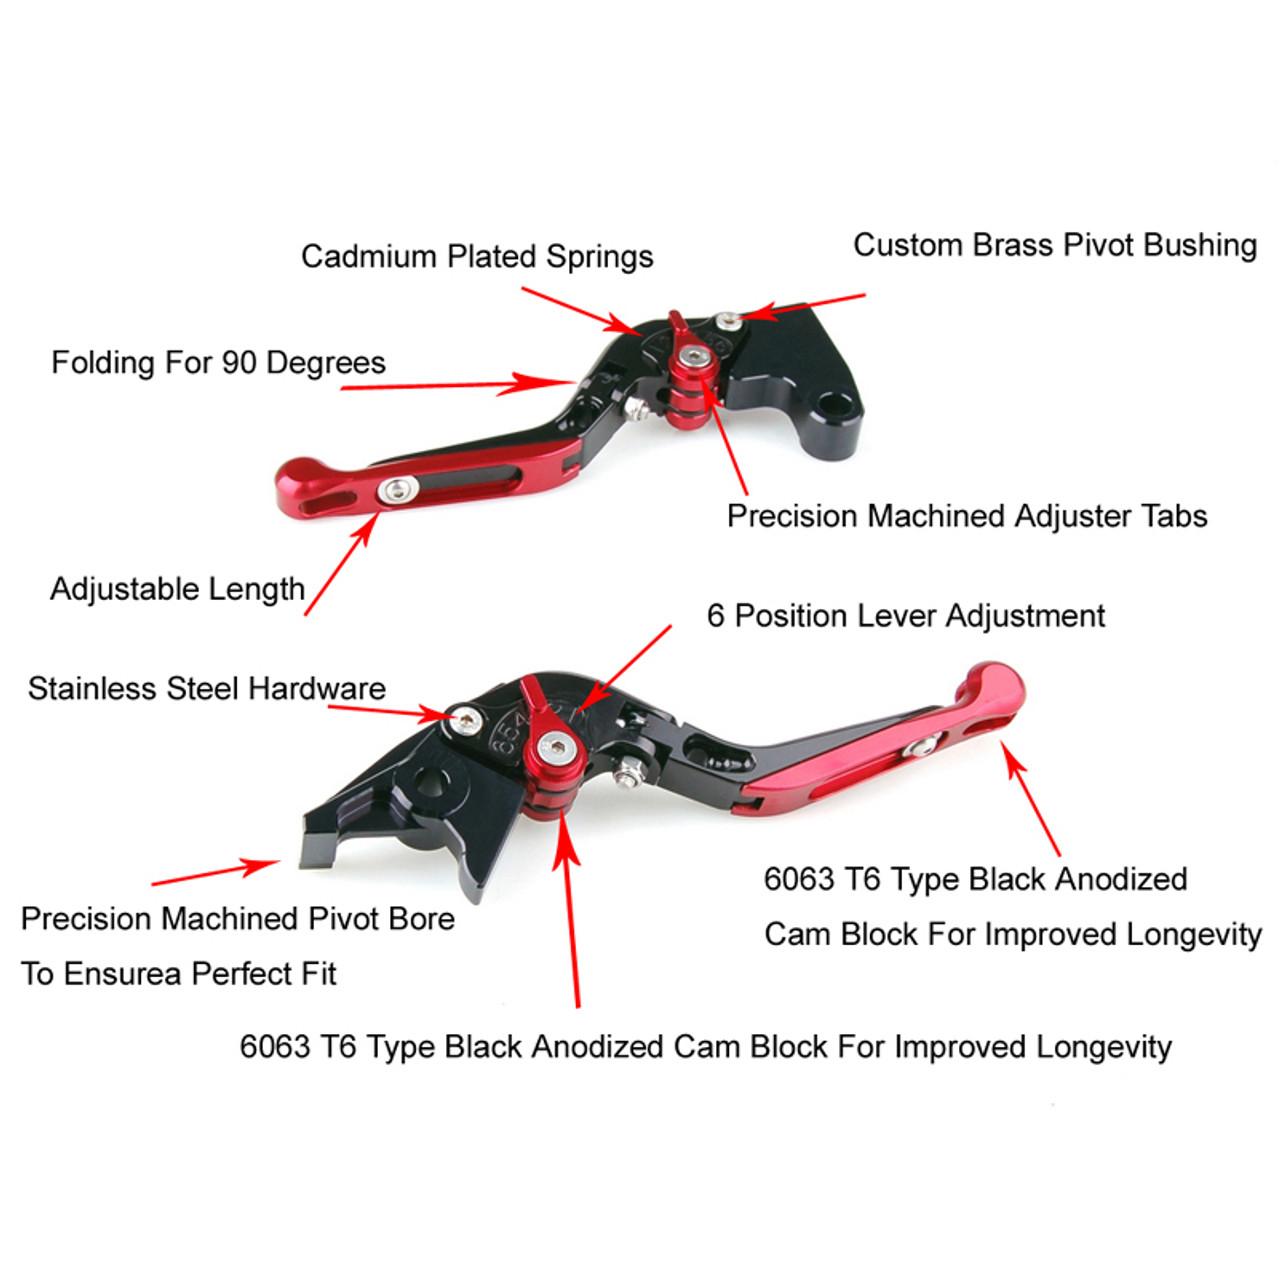 Staff Length Adjustable Brake Clutch Levers Ducati M900 M1000 2000-2005 (DB-80/DC-80)